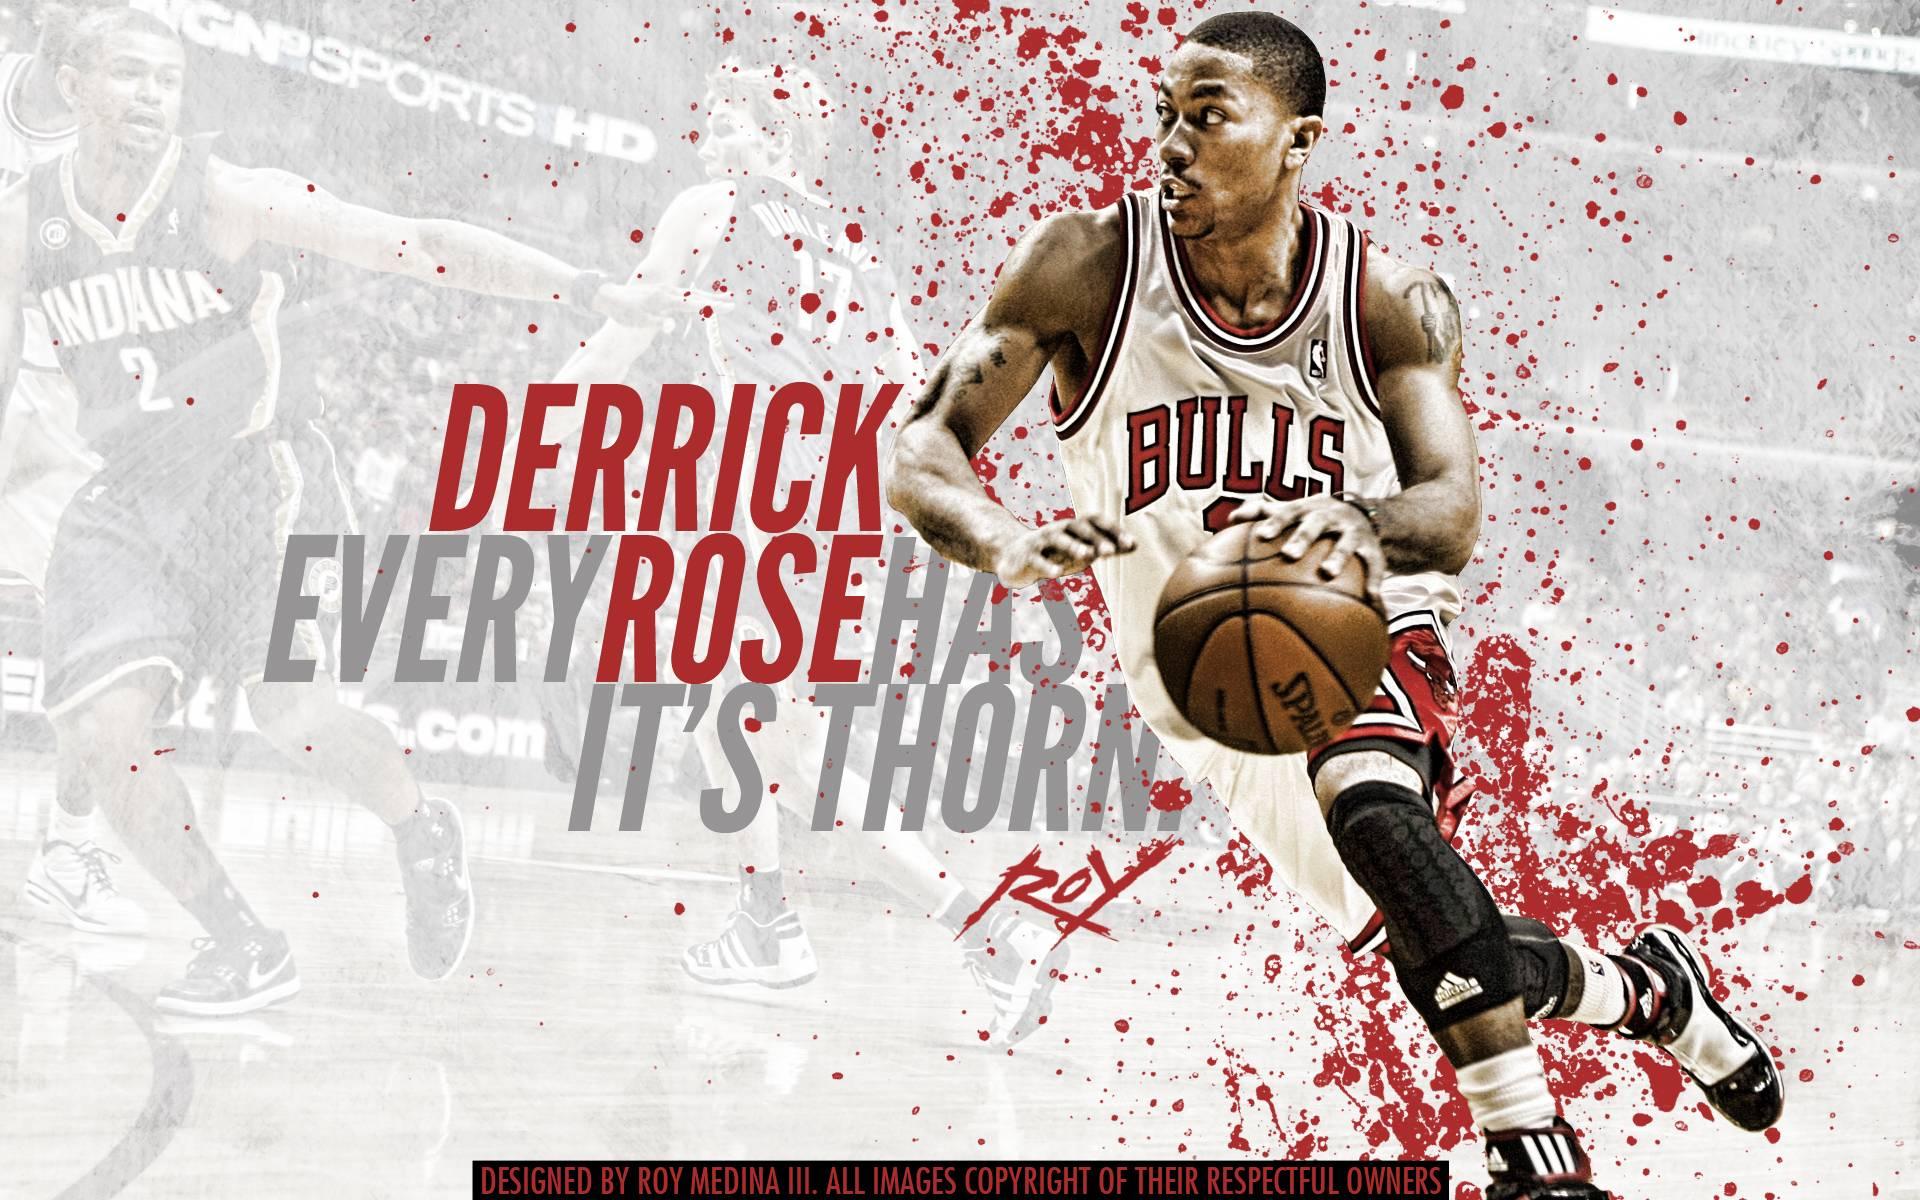 Cool Quotes Wallpapers For Desktop Derrick Rose Logo Wallpapers Wallpaper Cave